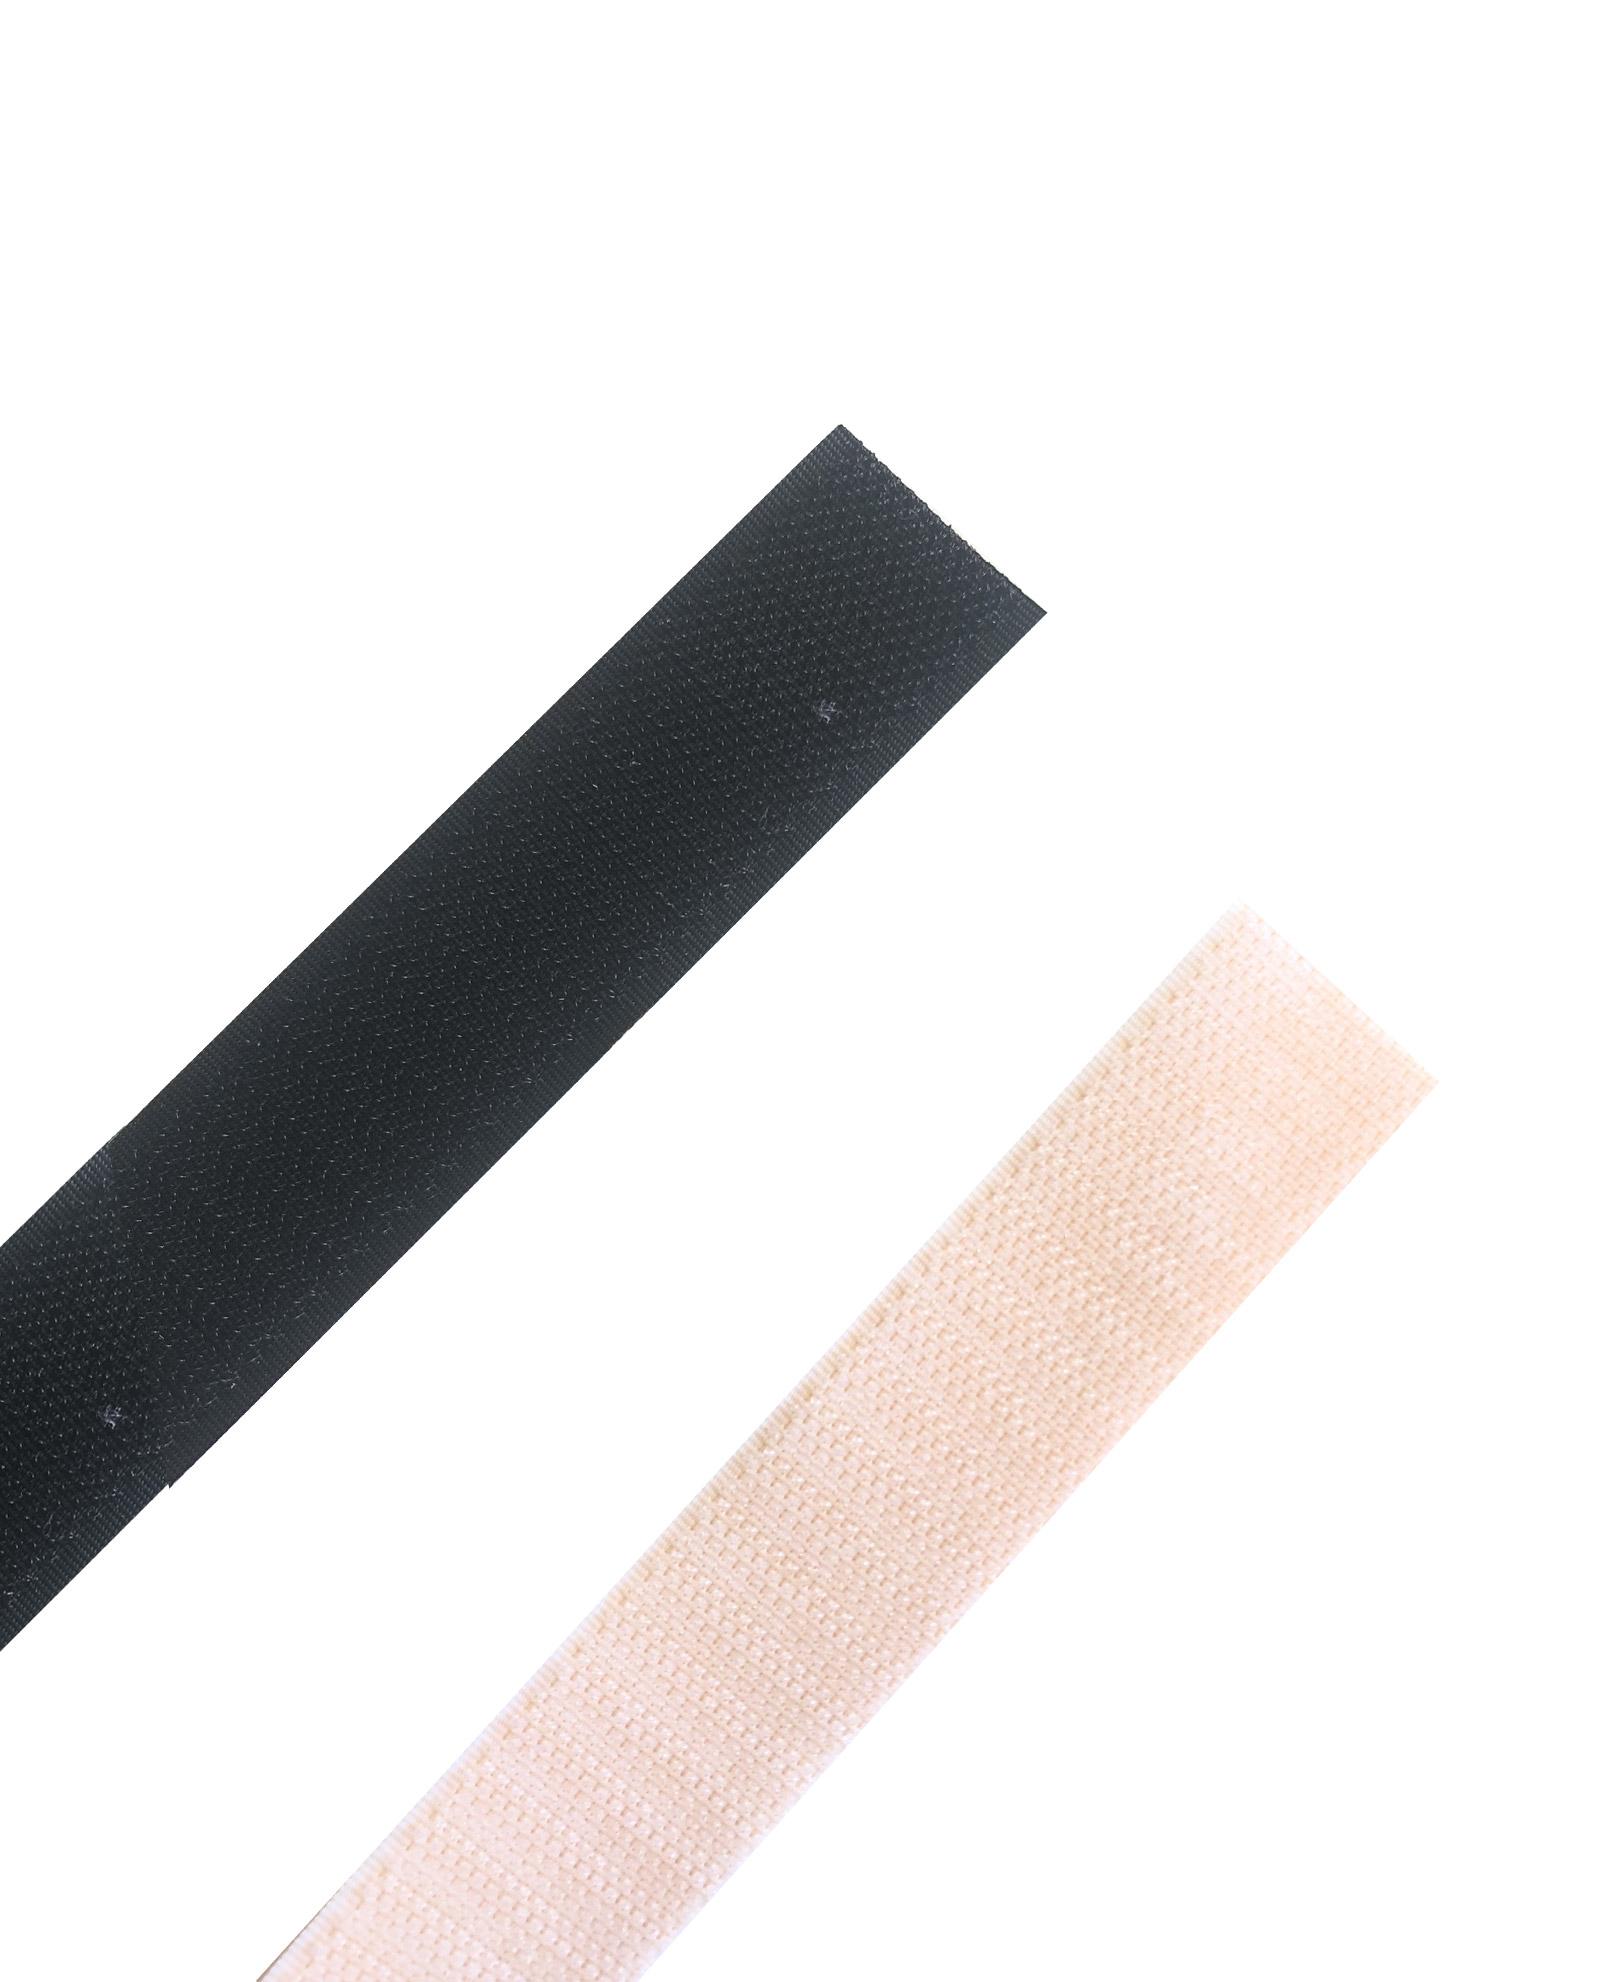 Velcro Generic Hook Fastening Self Adhesive 25mm X 25m Roll Hooks 1